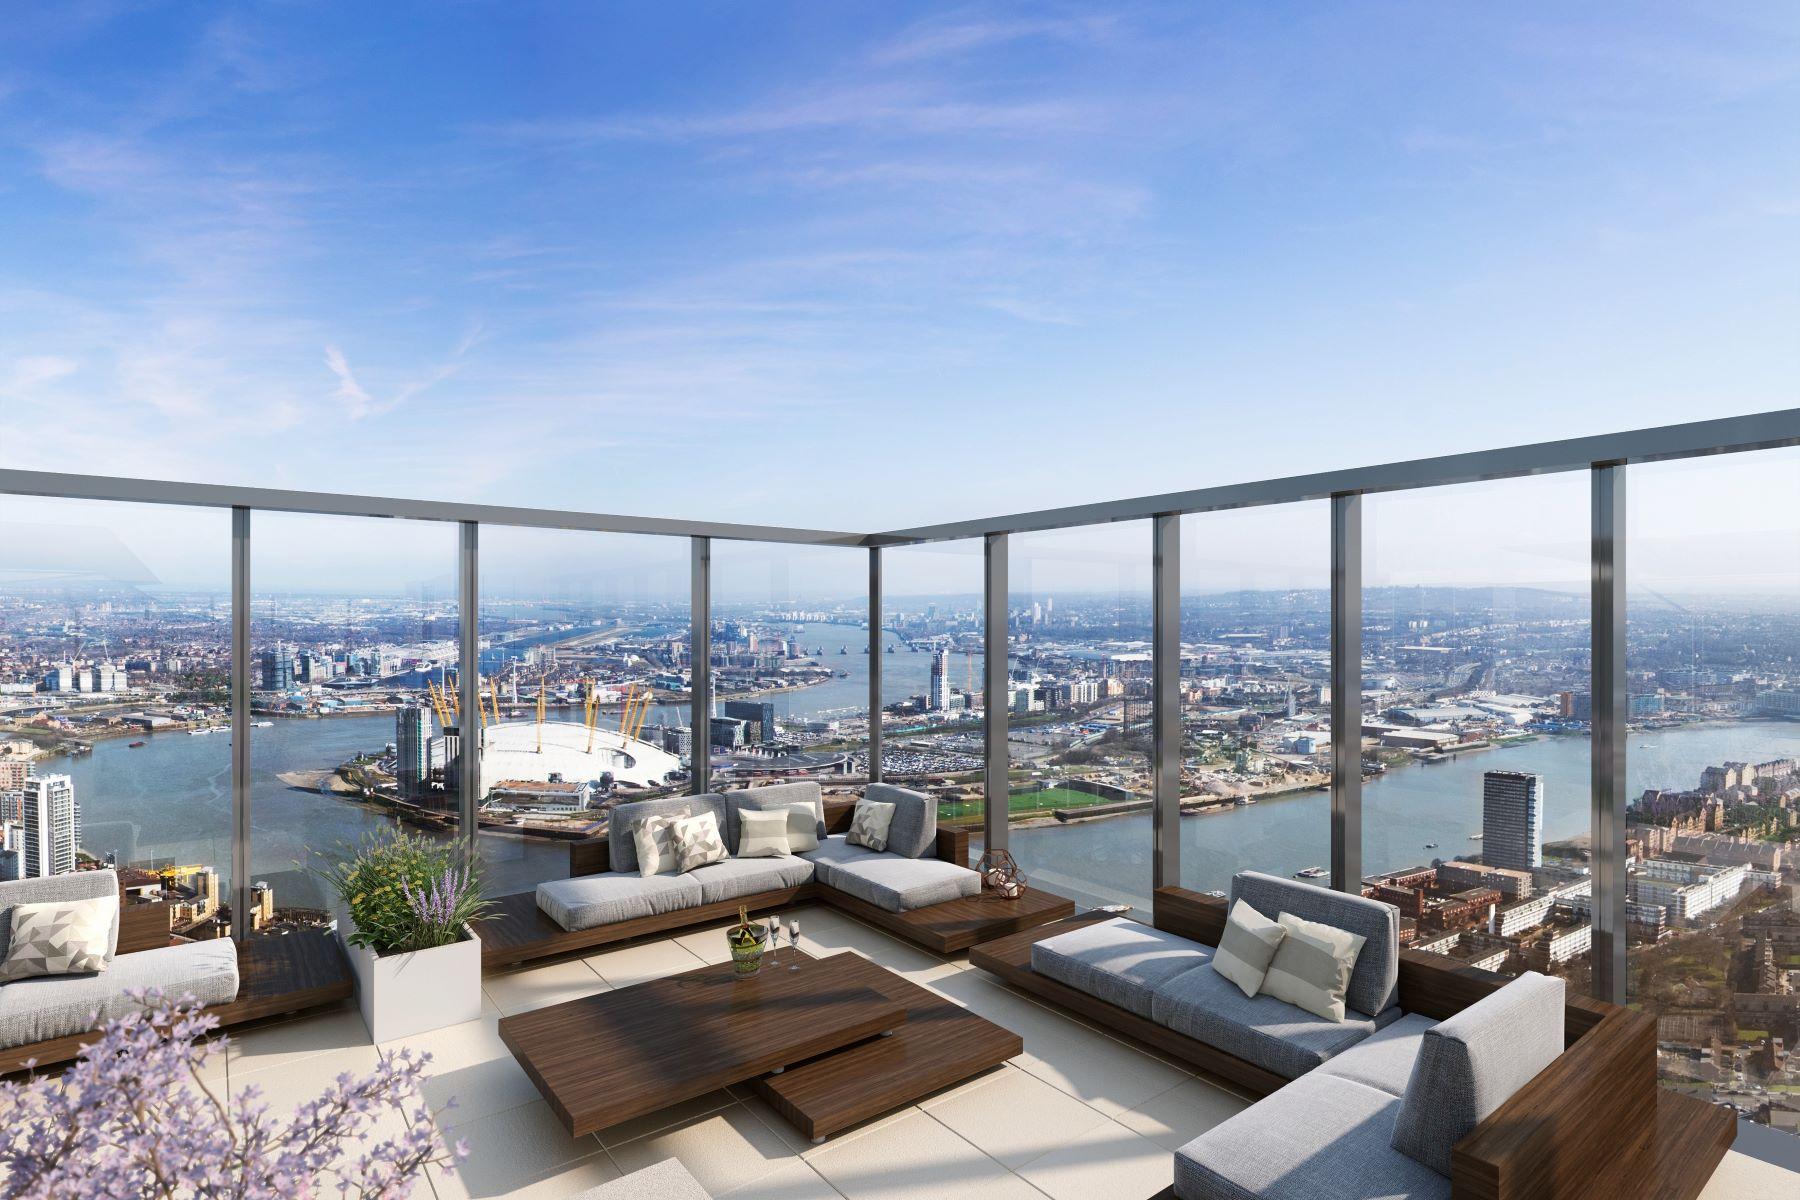 Apartments for Sale at 43.11, Valiant Tower London, England E14 9SH United Kingdom